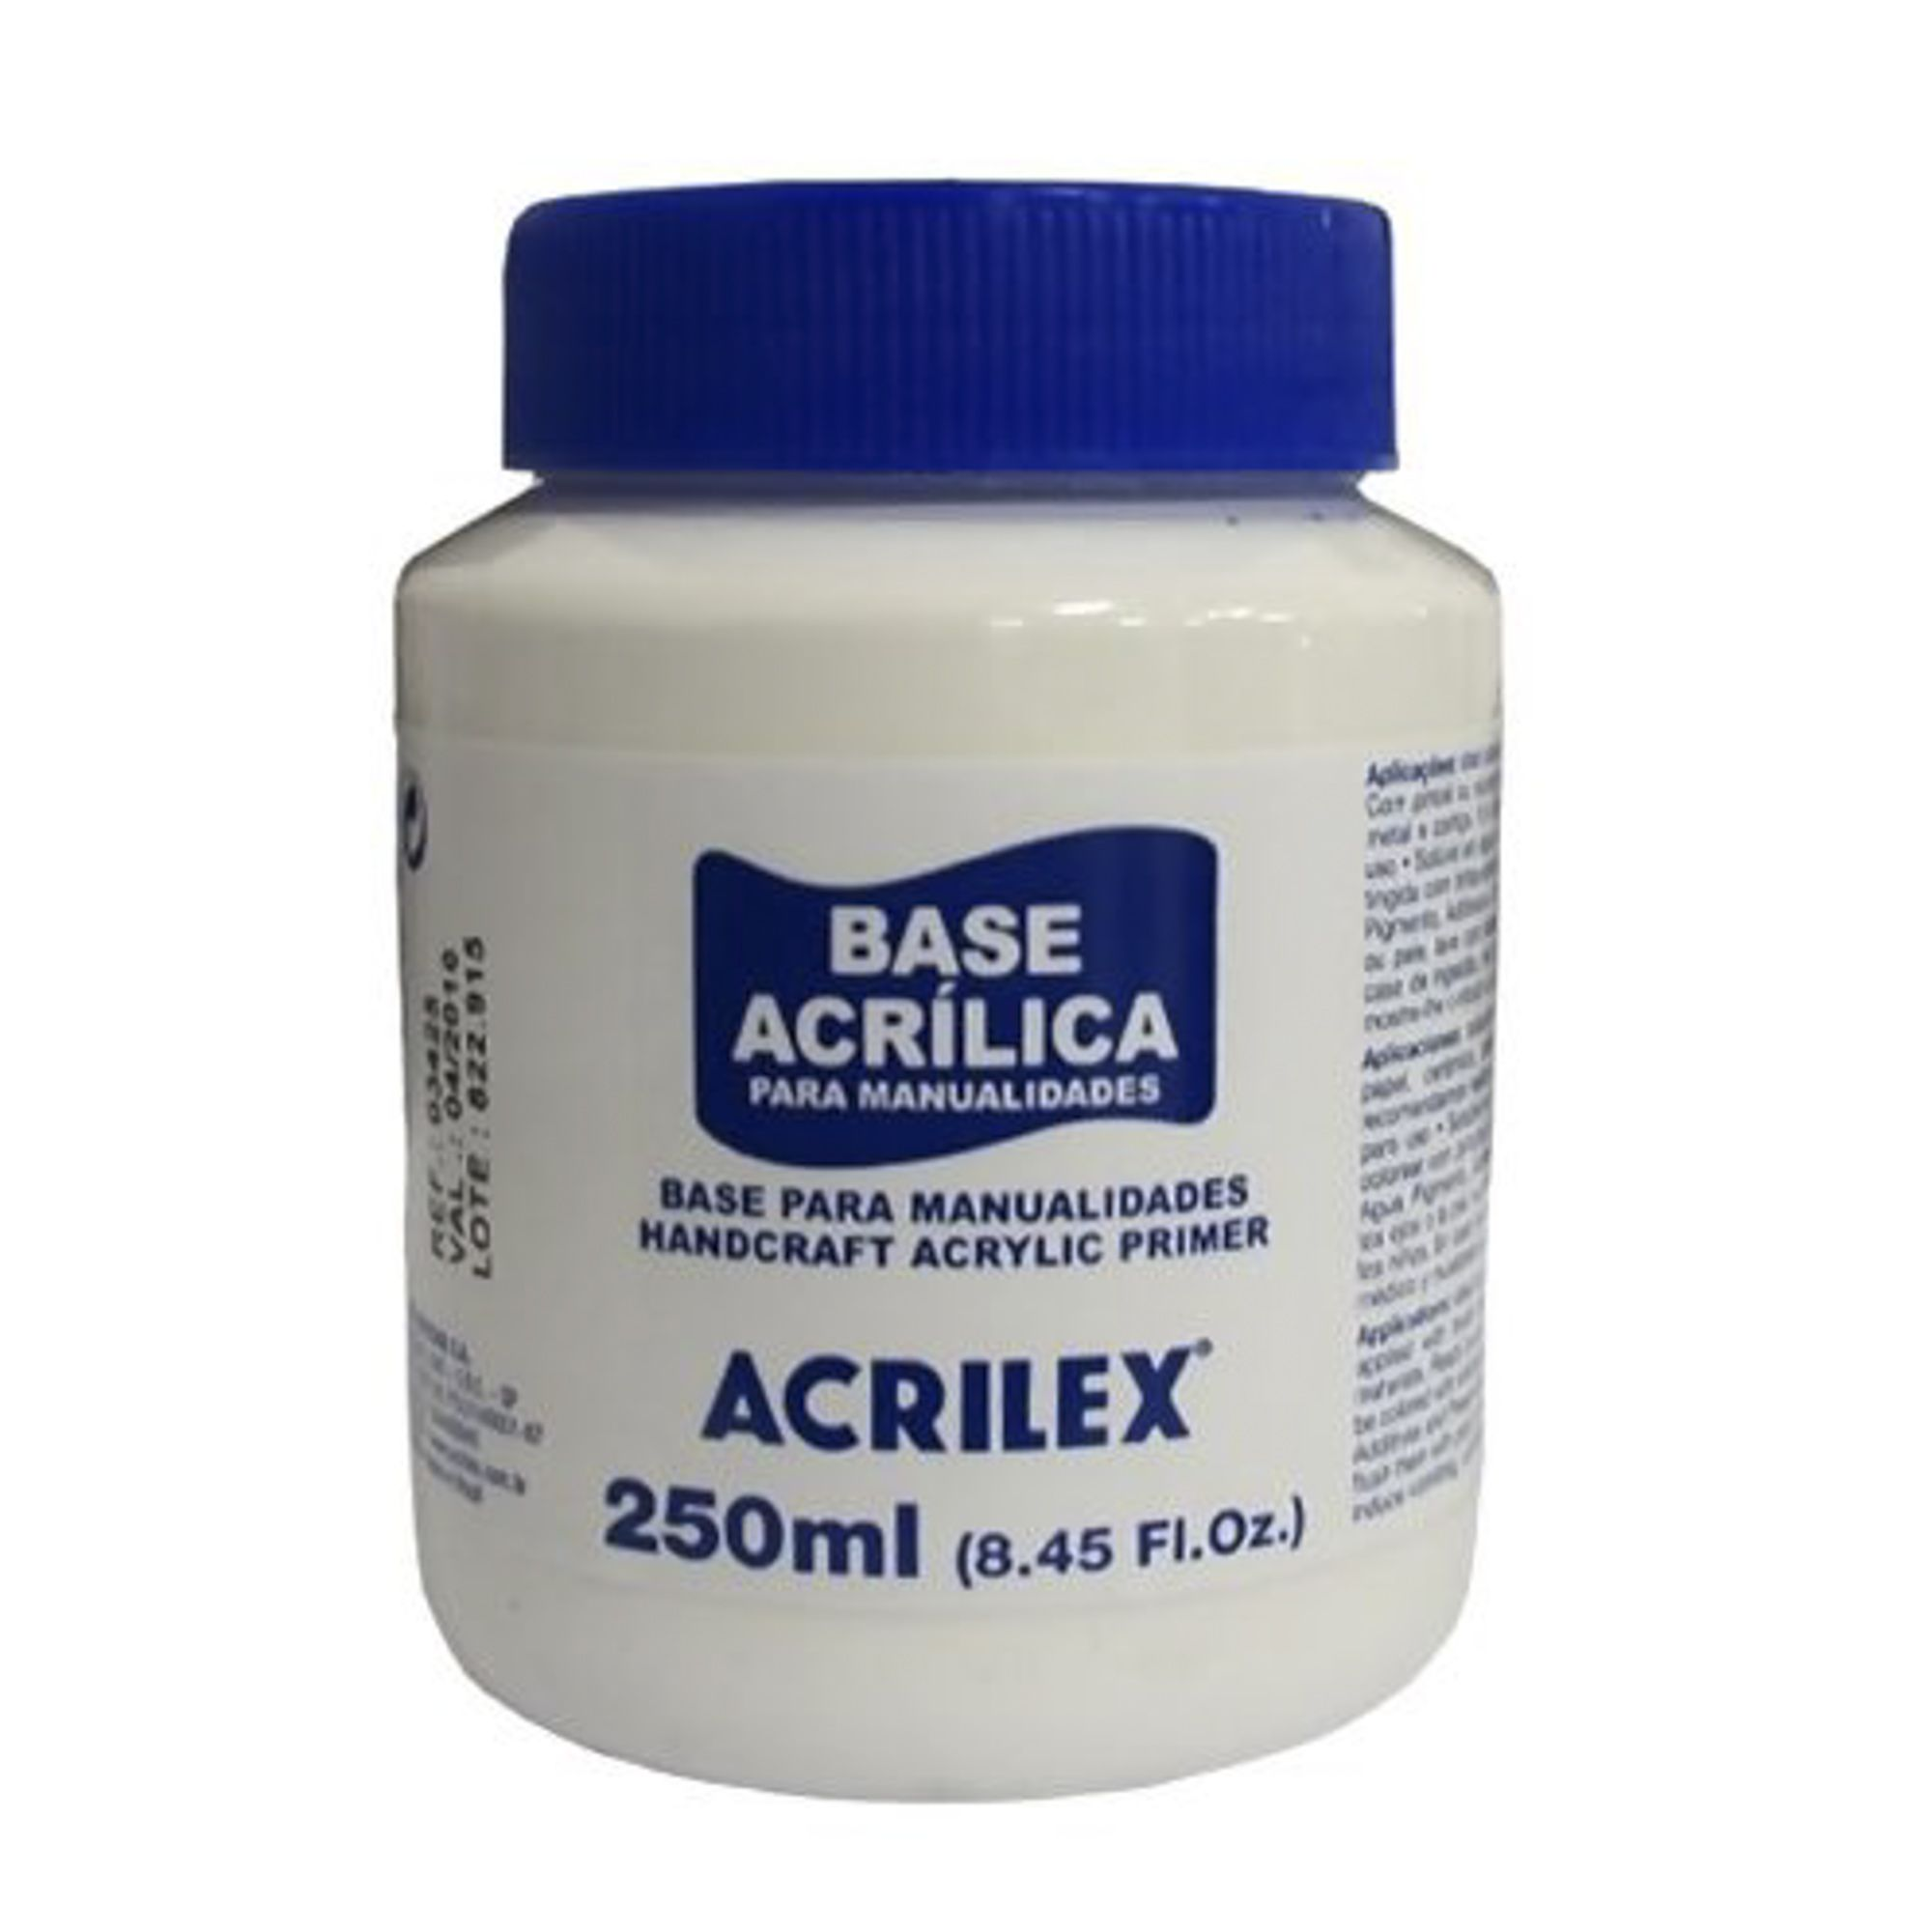 Base Acrilica para Artesanato Acrilex 250ml